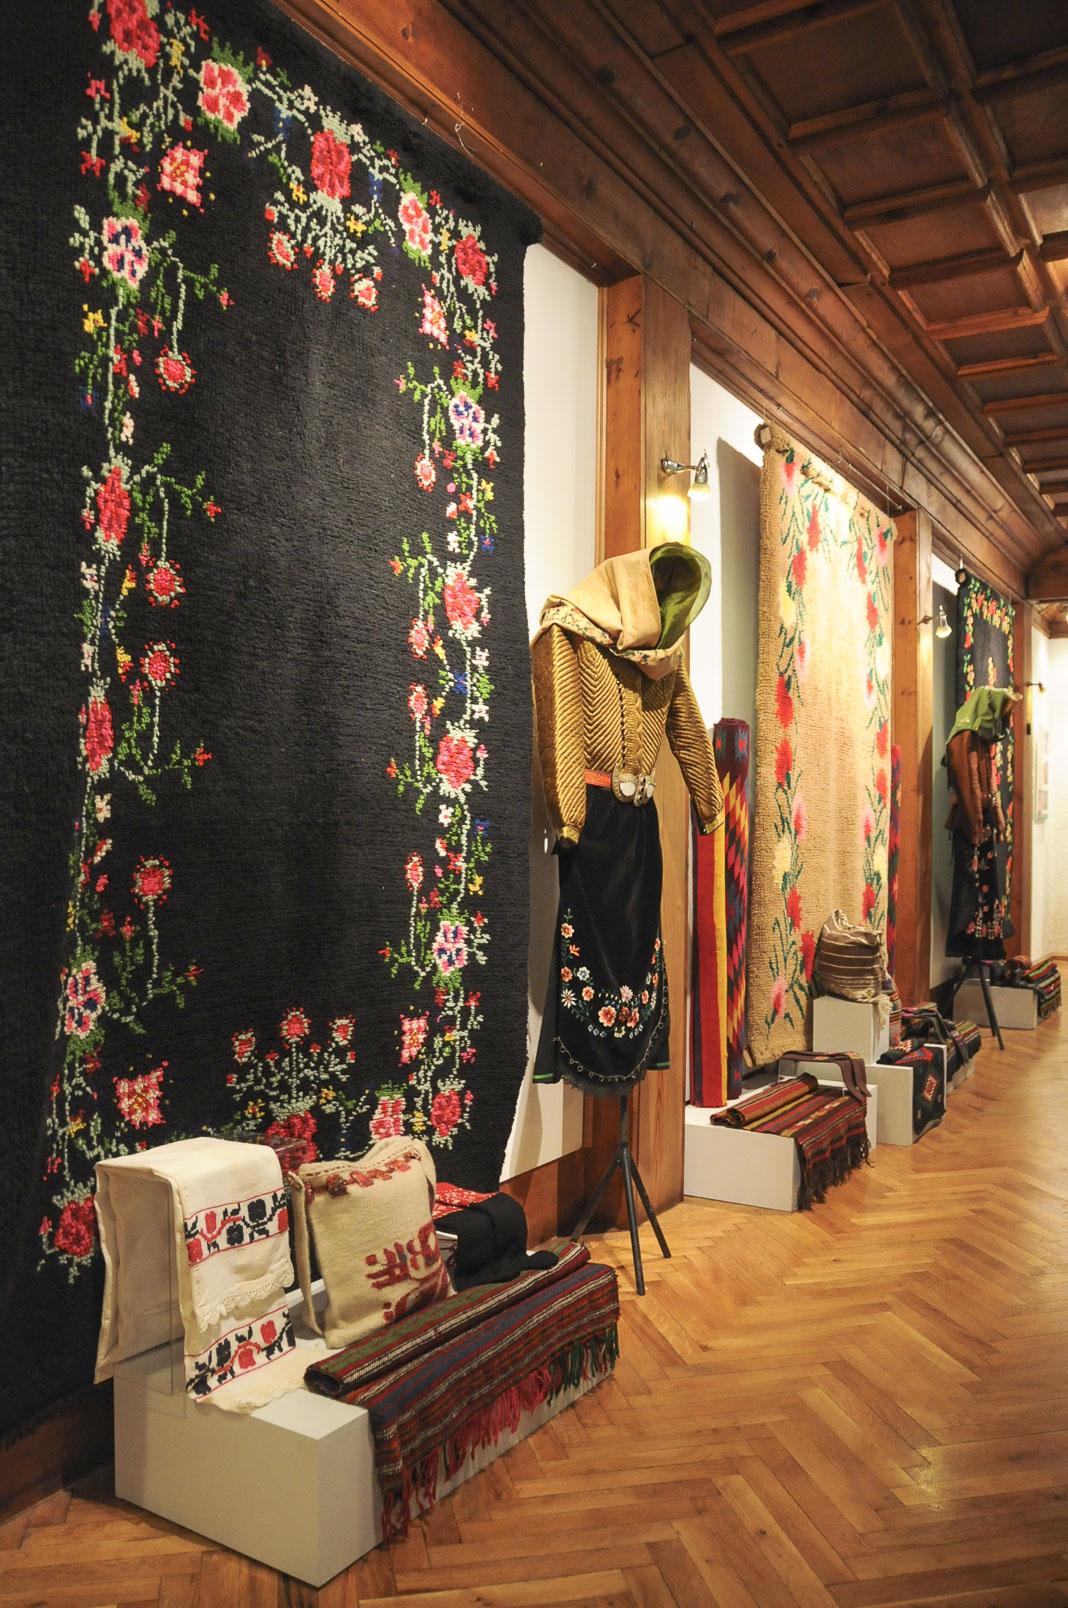 troyan-museum-cvetqta-na-zografa-11